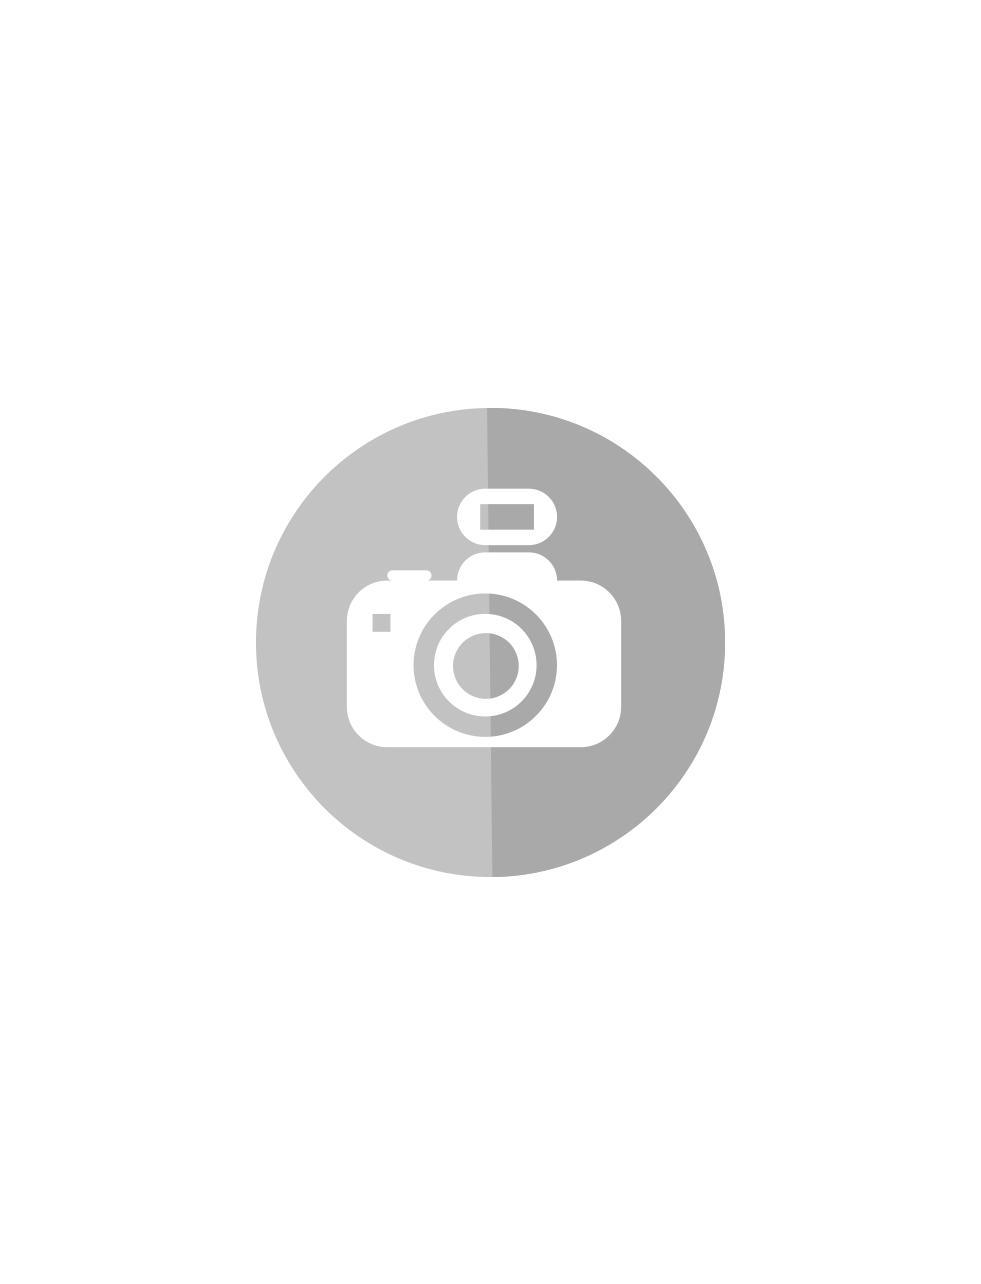 category_image_LIZENZ_ARTIKEL